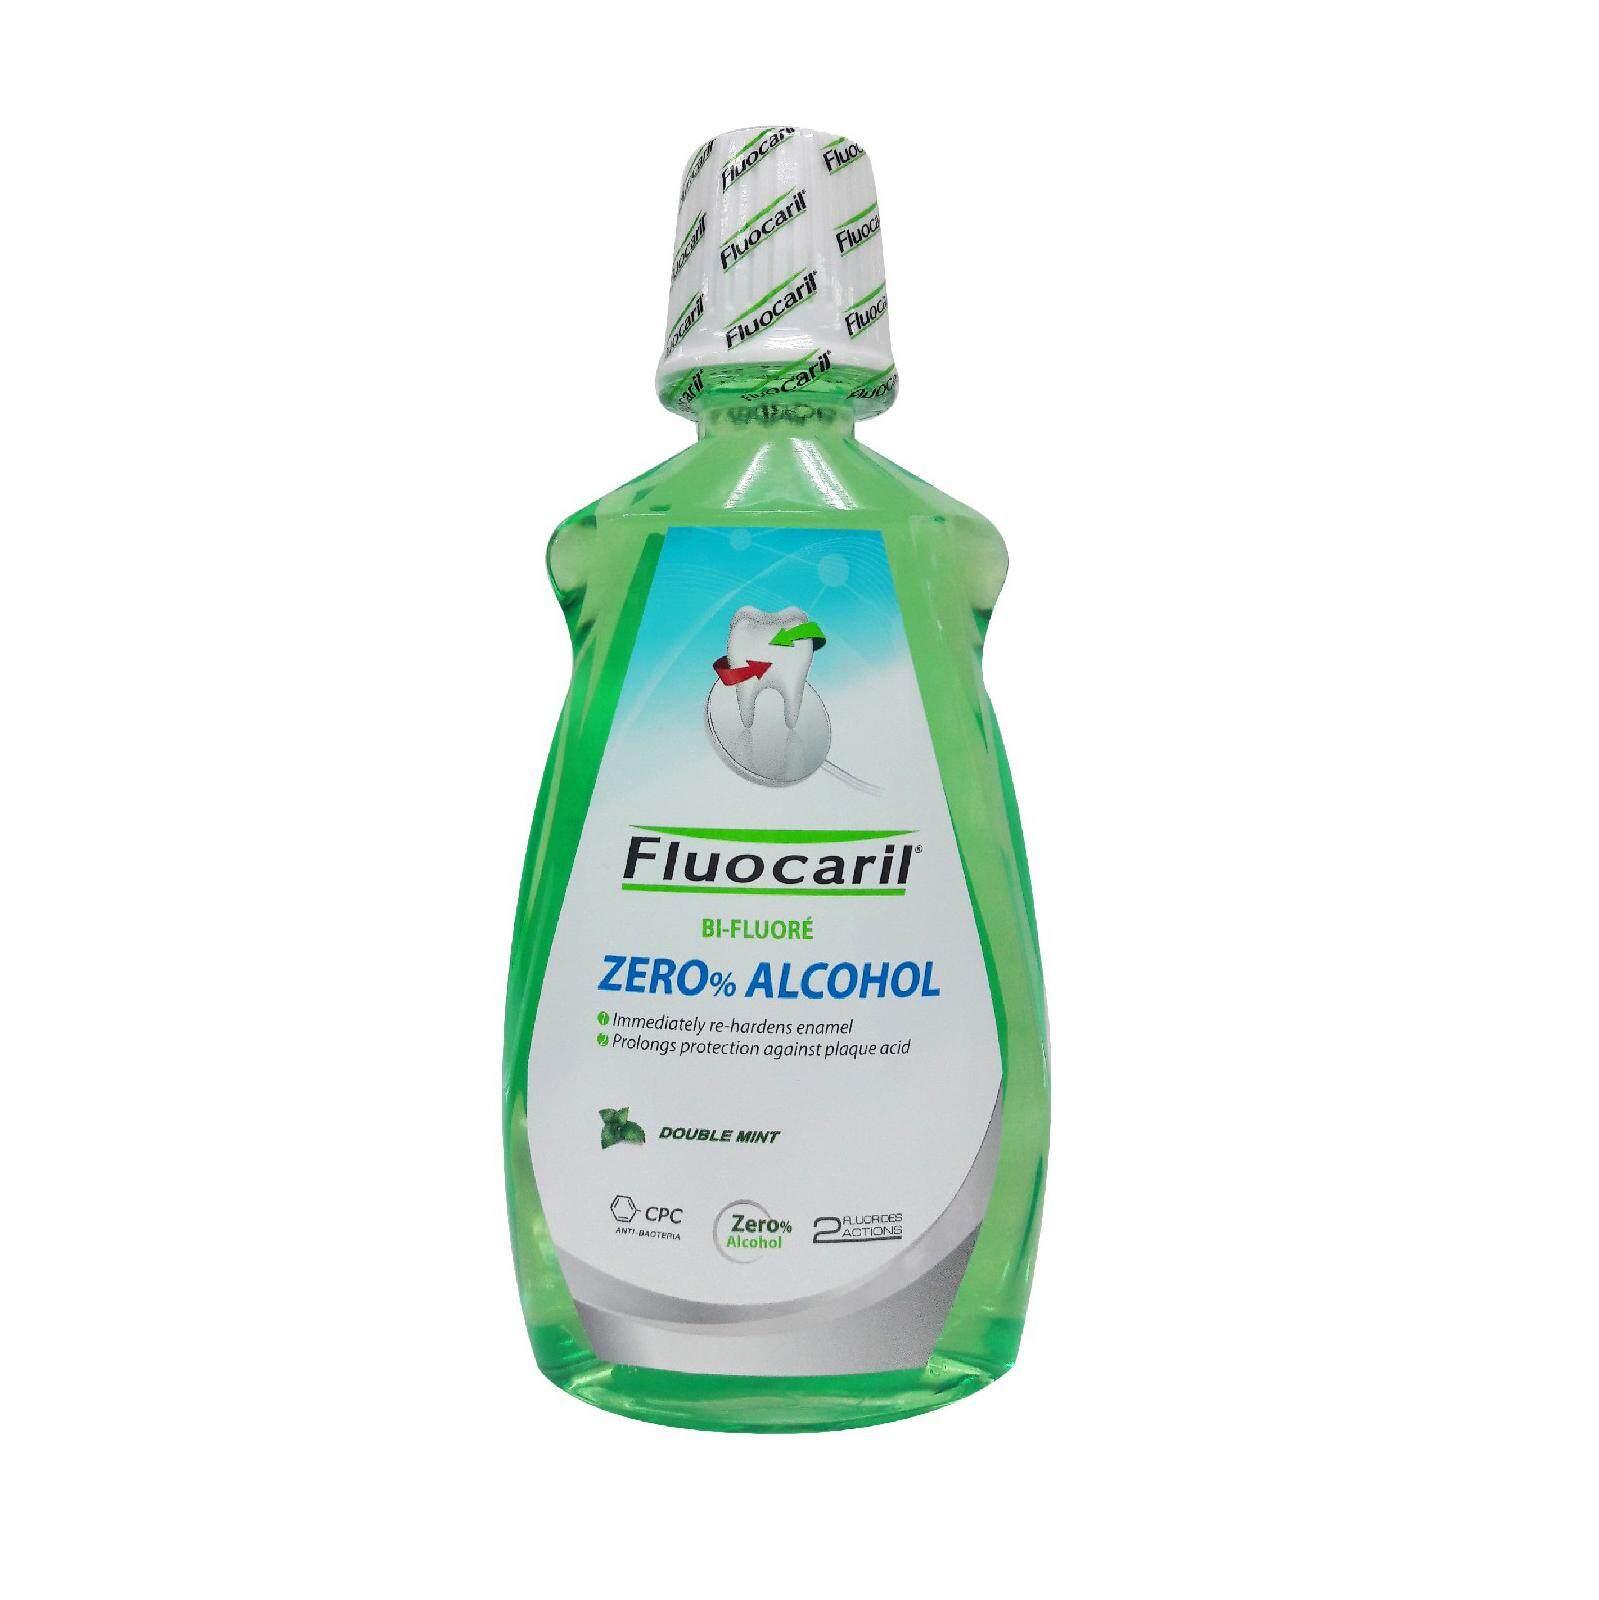 Fluocaril น้ำยาบ้วนปาก ฟลูโอคารีล ซีโร่แอลกอฮอล์ ดับเบิ้ลมิ้นท์ 500 มล. FLUOCARIL ZERO DOUBLE MINT 500ML. (Mouthwash,Mouth,Oral,Oral Care,น้ำยาบ้วนปาก,ช่องปาก,สุขภาพฟัน) ของแท้